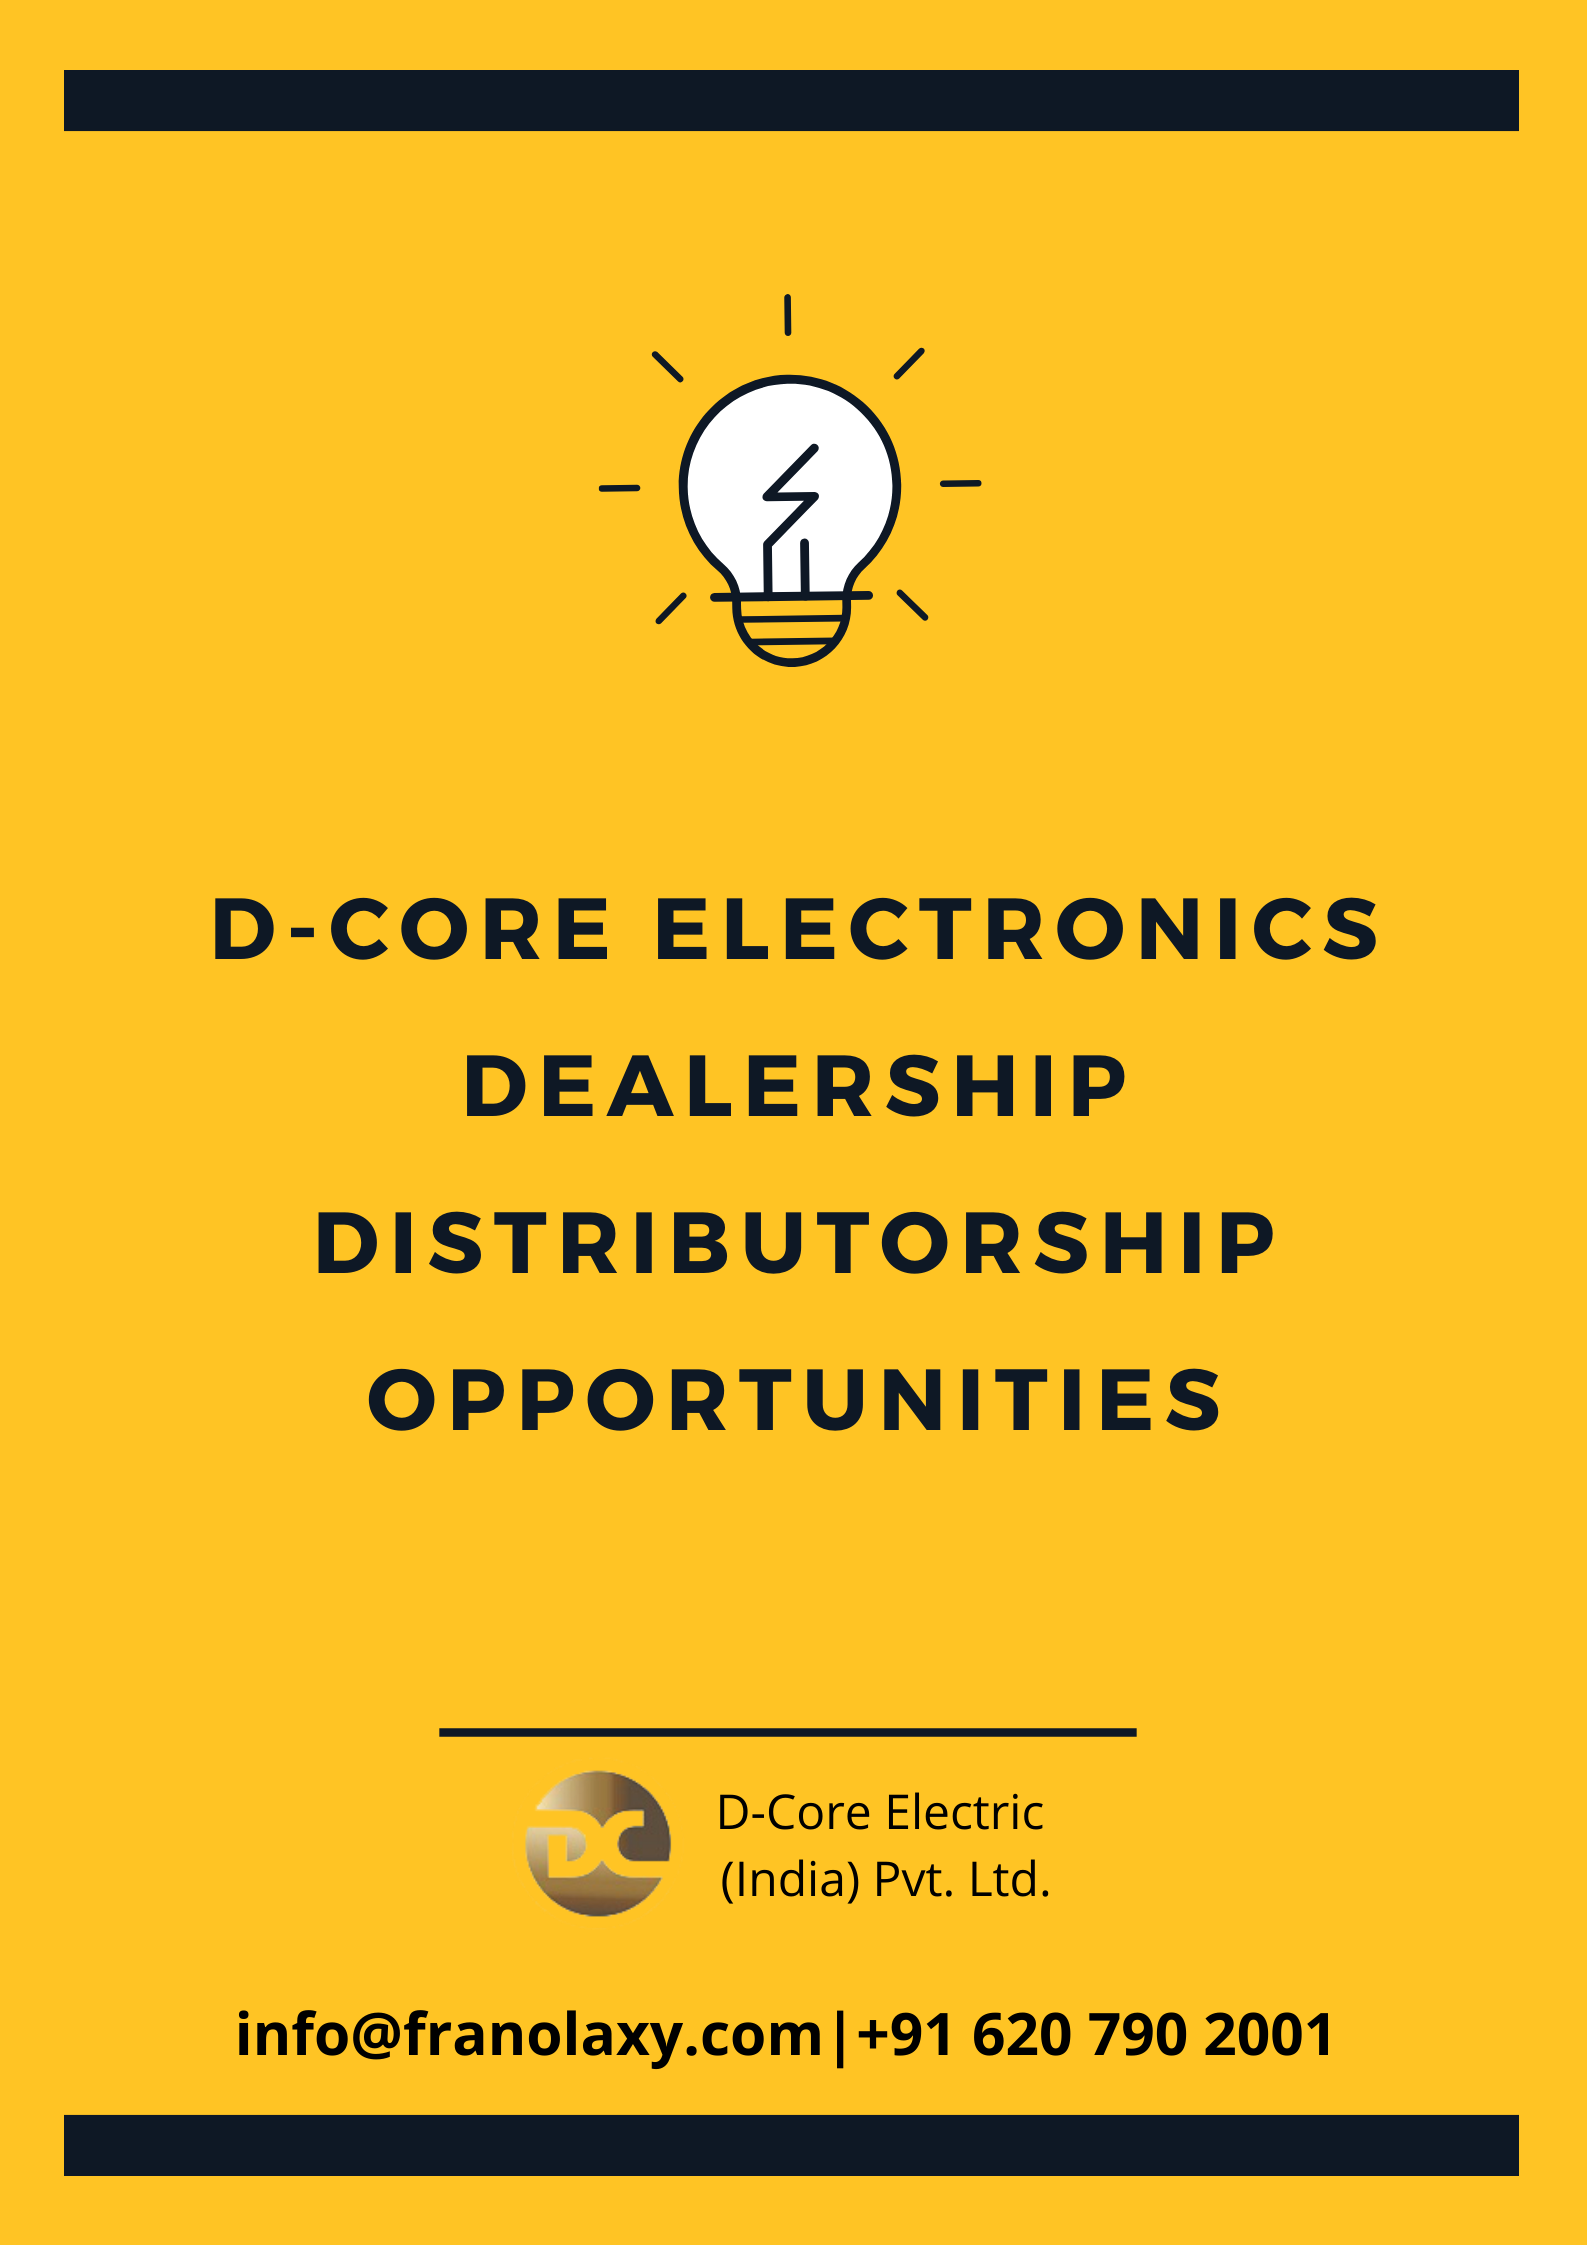 DCore Electronics Dealership/Distributorship